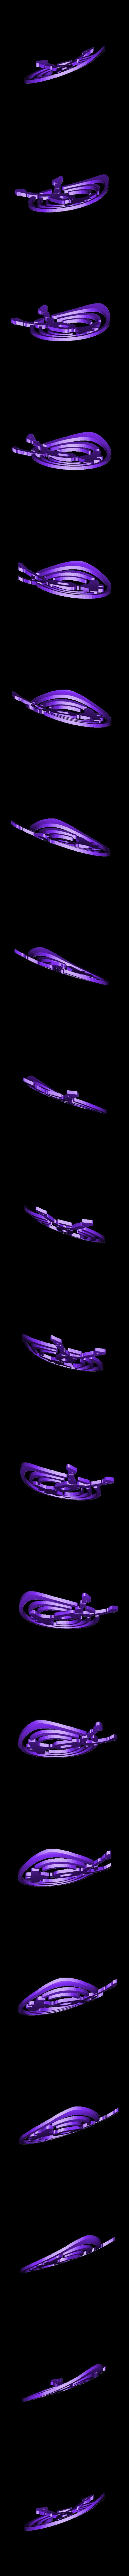 pathfinder_engrave_2.stl Download free STL file Xbox One S Custom Controller Shell: Apex Legend Pathfinder Edition • Design to 3D print, mmjames